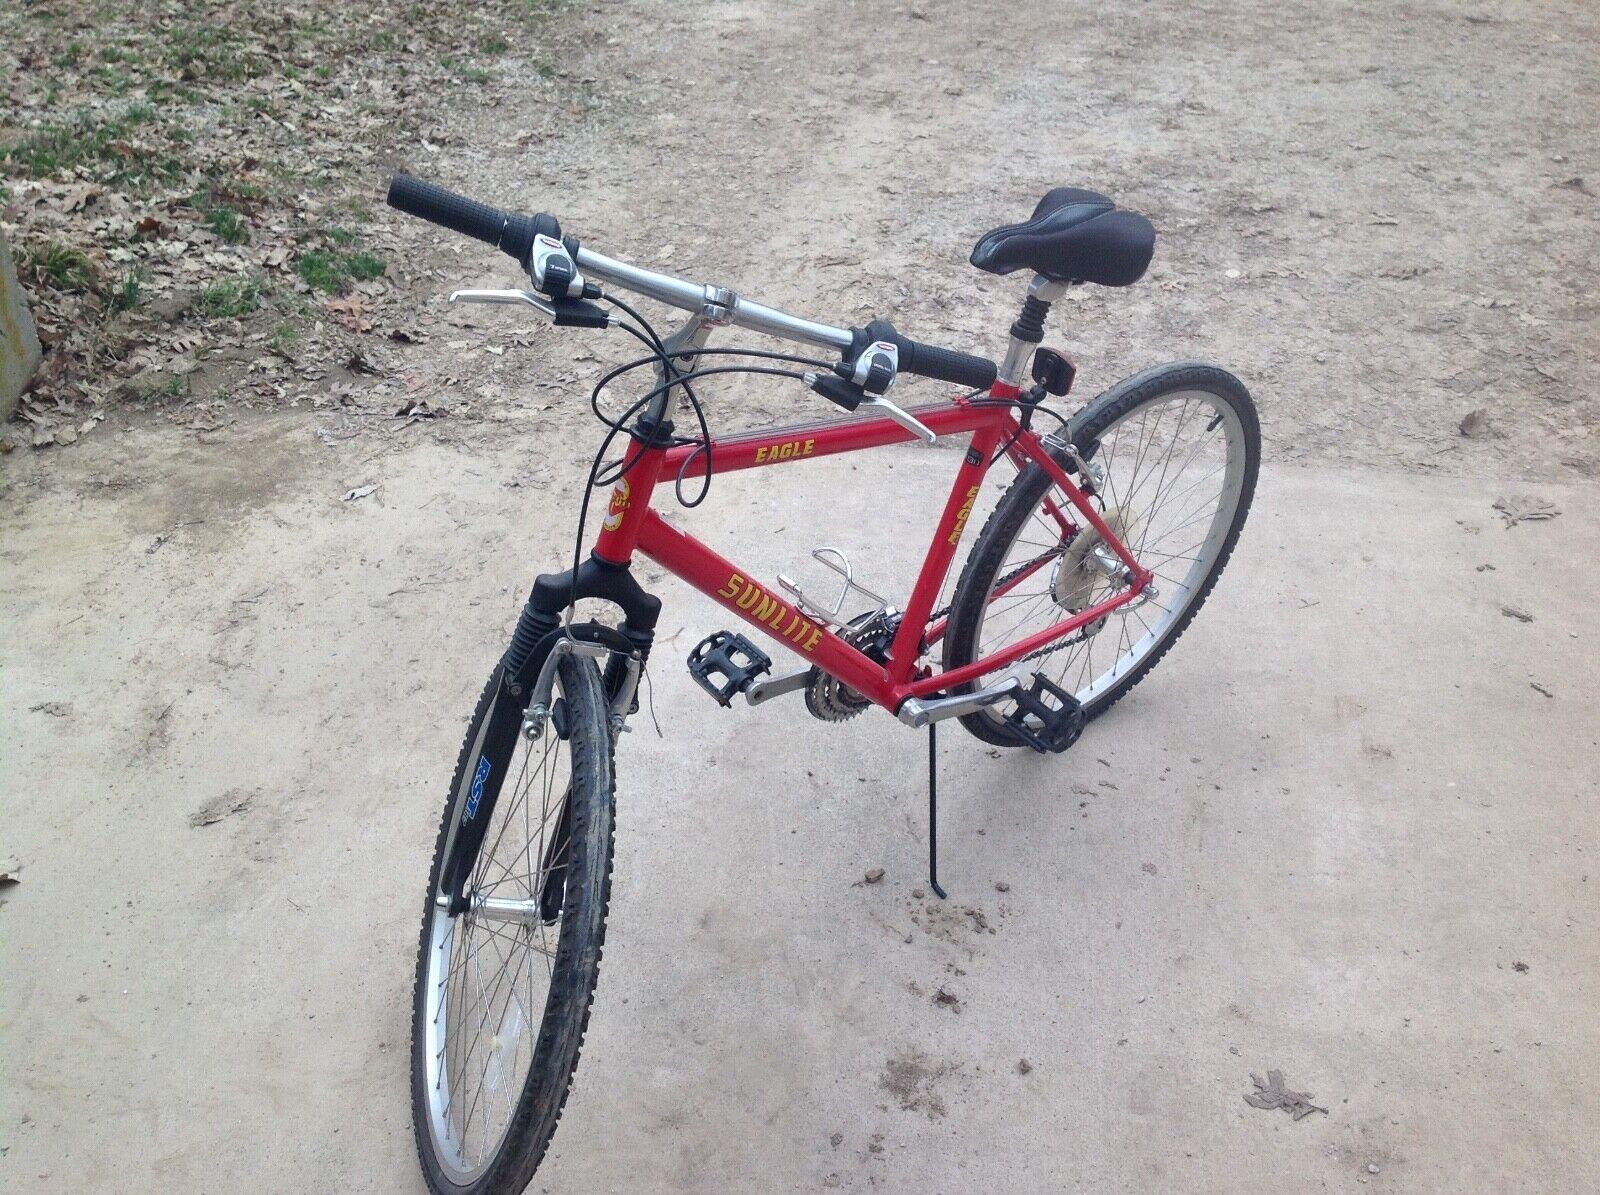 21 Speed Sunlite eagle 22 inch wheels, 18 inch frame, Mens Bike Red